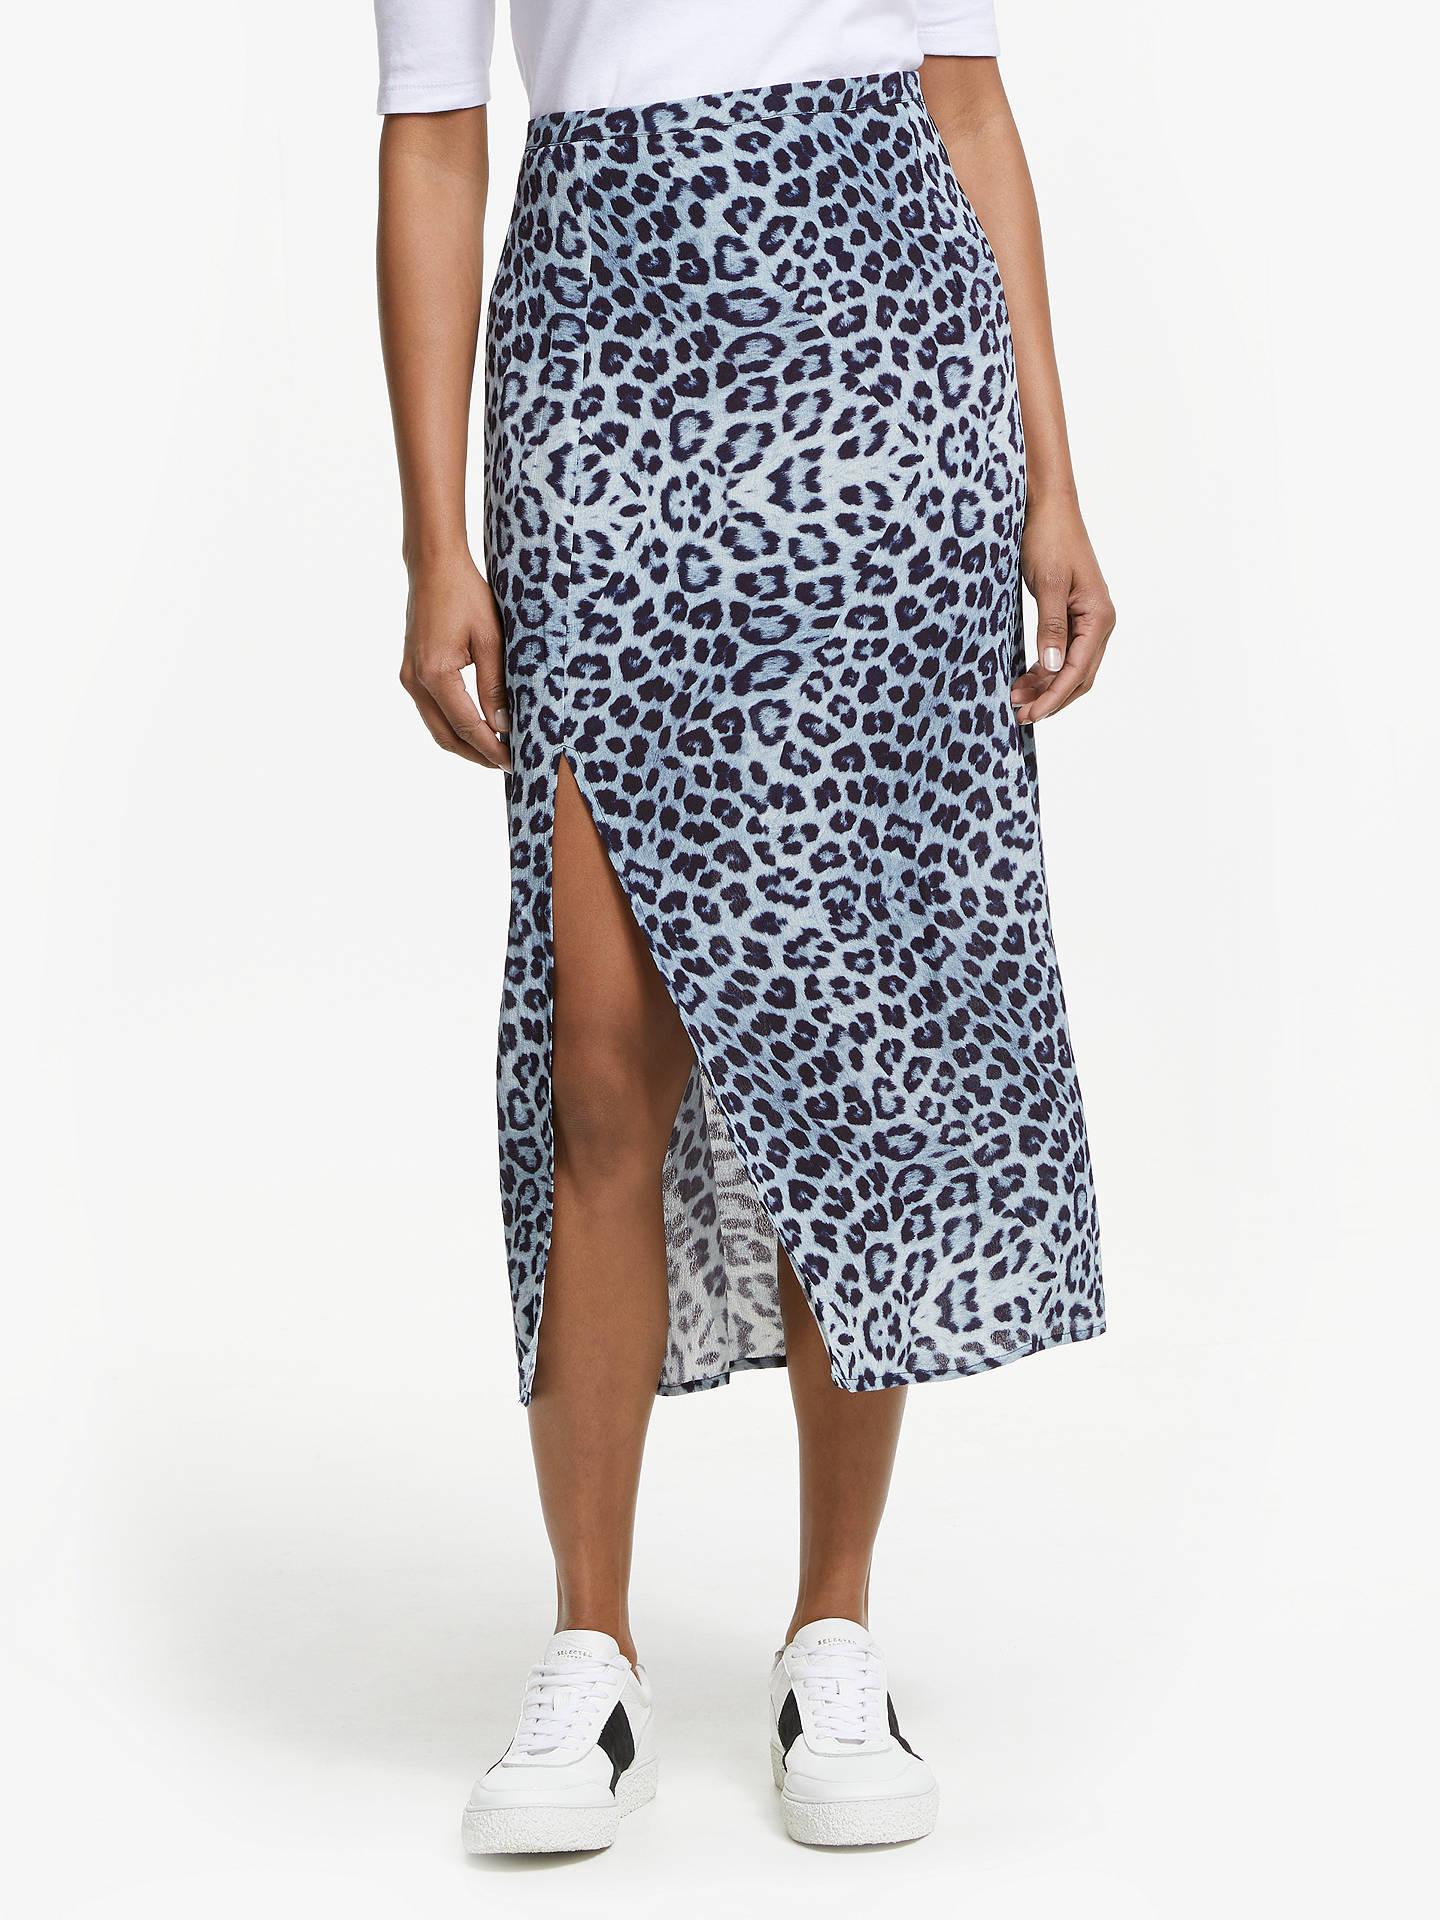 0c07ffba8 Buy Lily and Lionel Grace Animal Print Skirt, Safari Denim, XS Online at  johnlewis ...